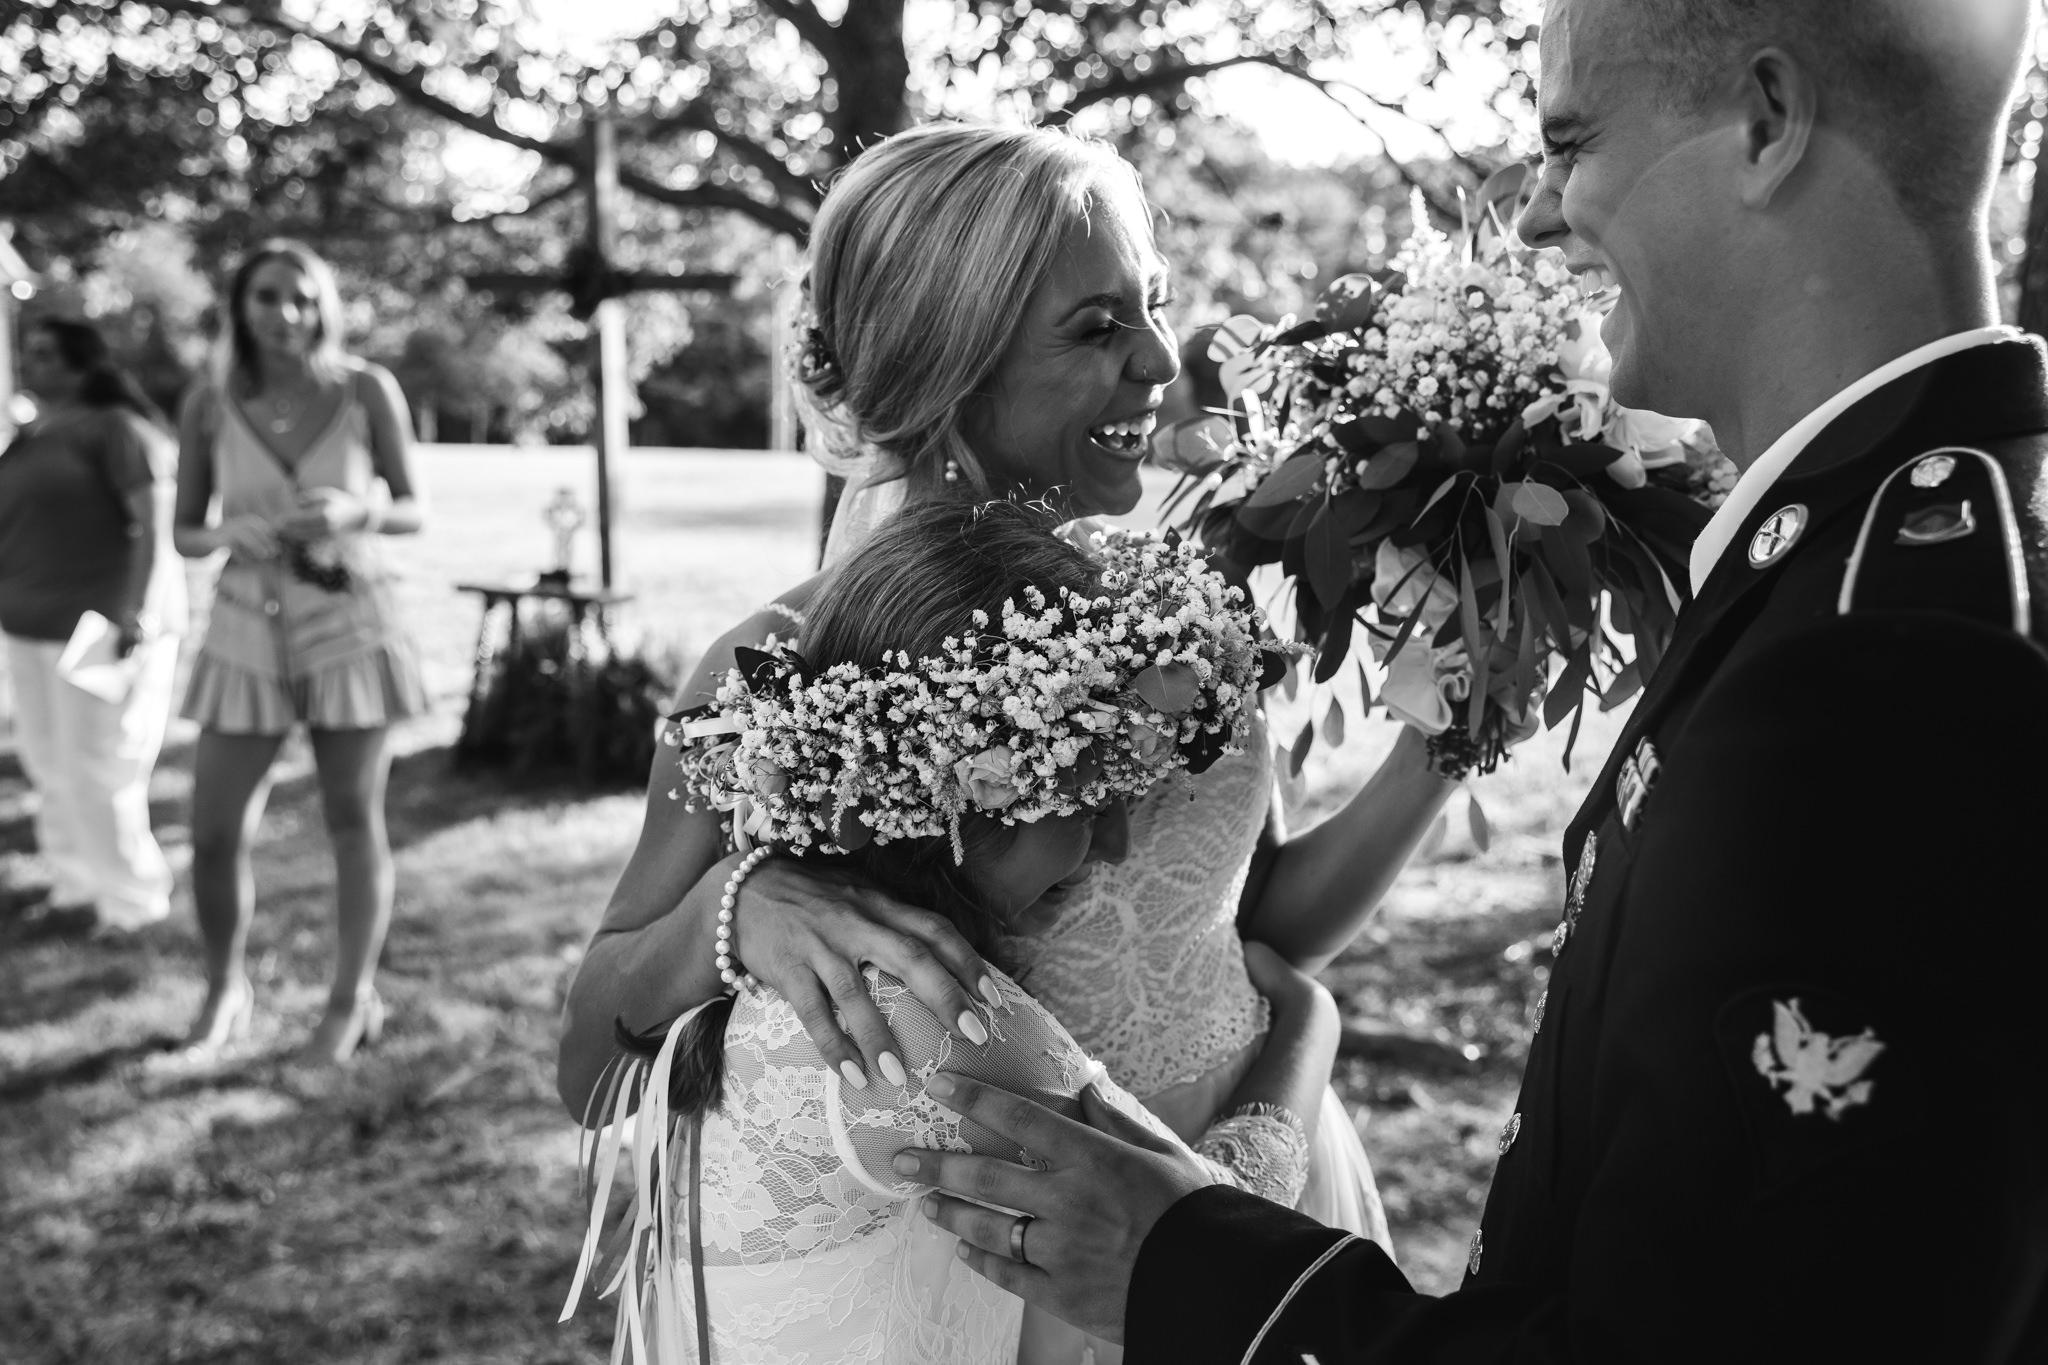 zbackyard-wedding-thewarmtharoundyou-lexy-branson-413.jpg